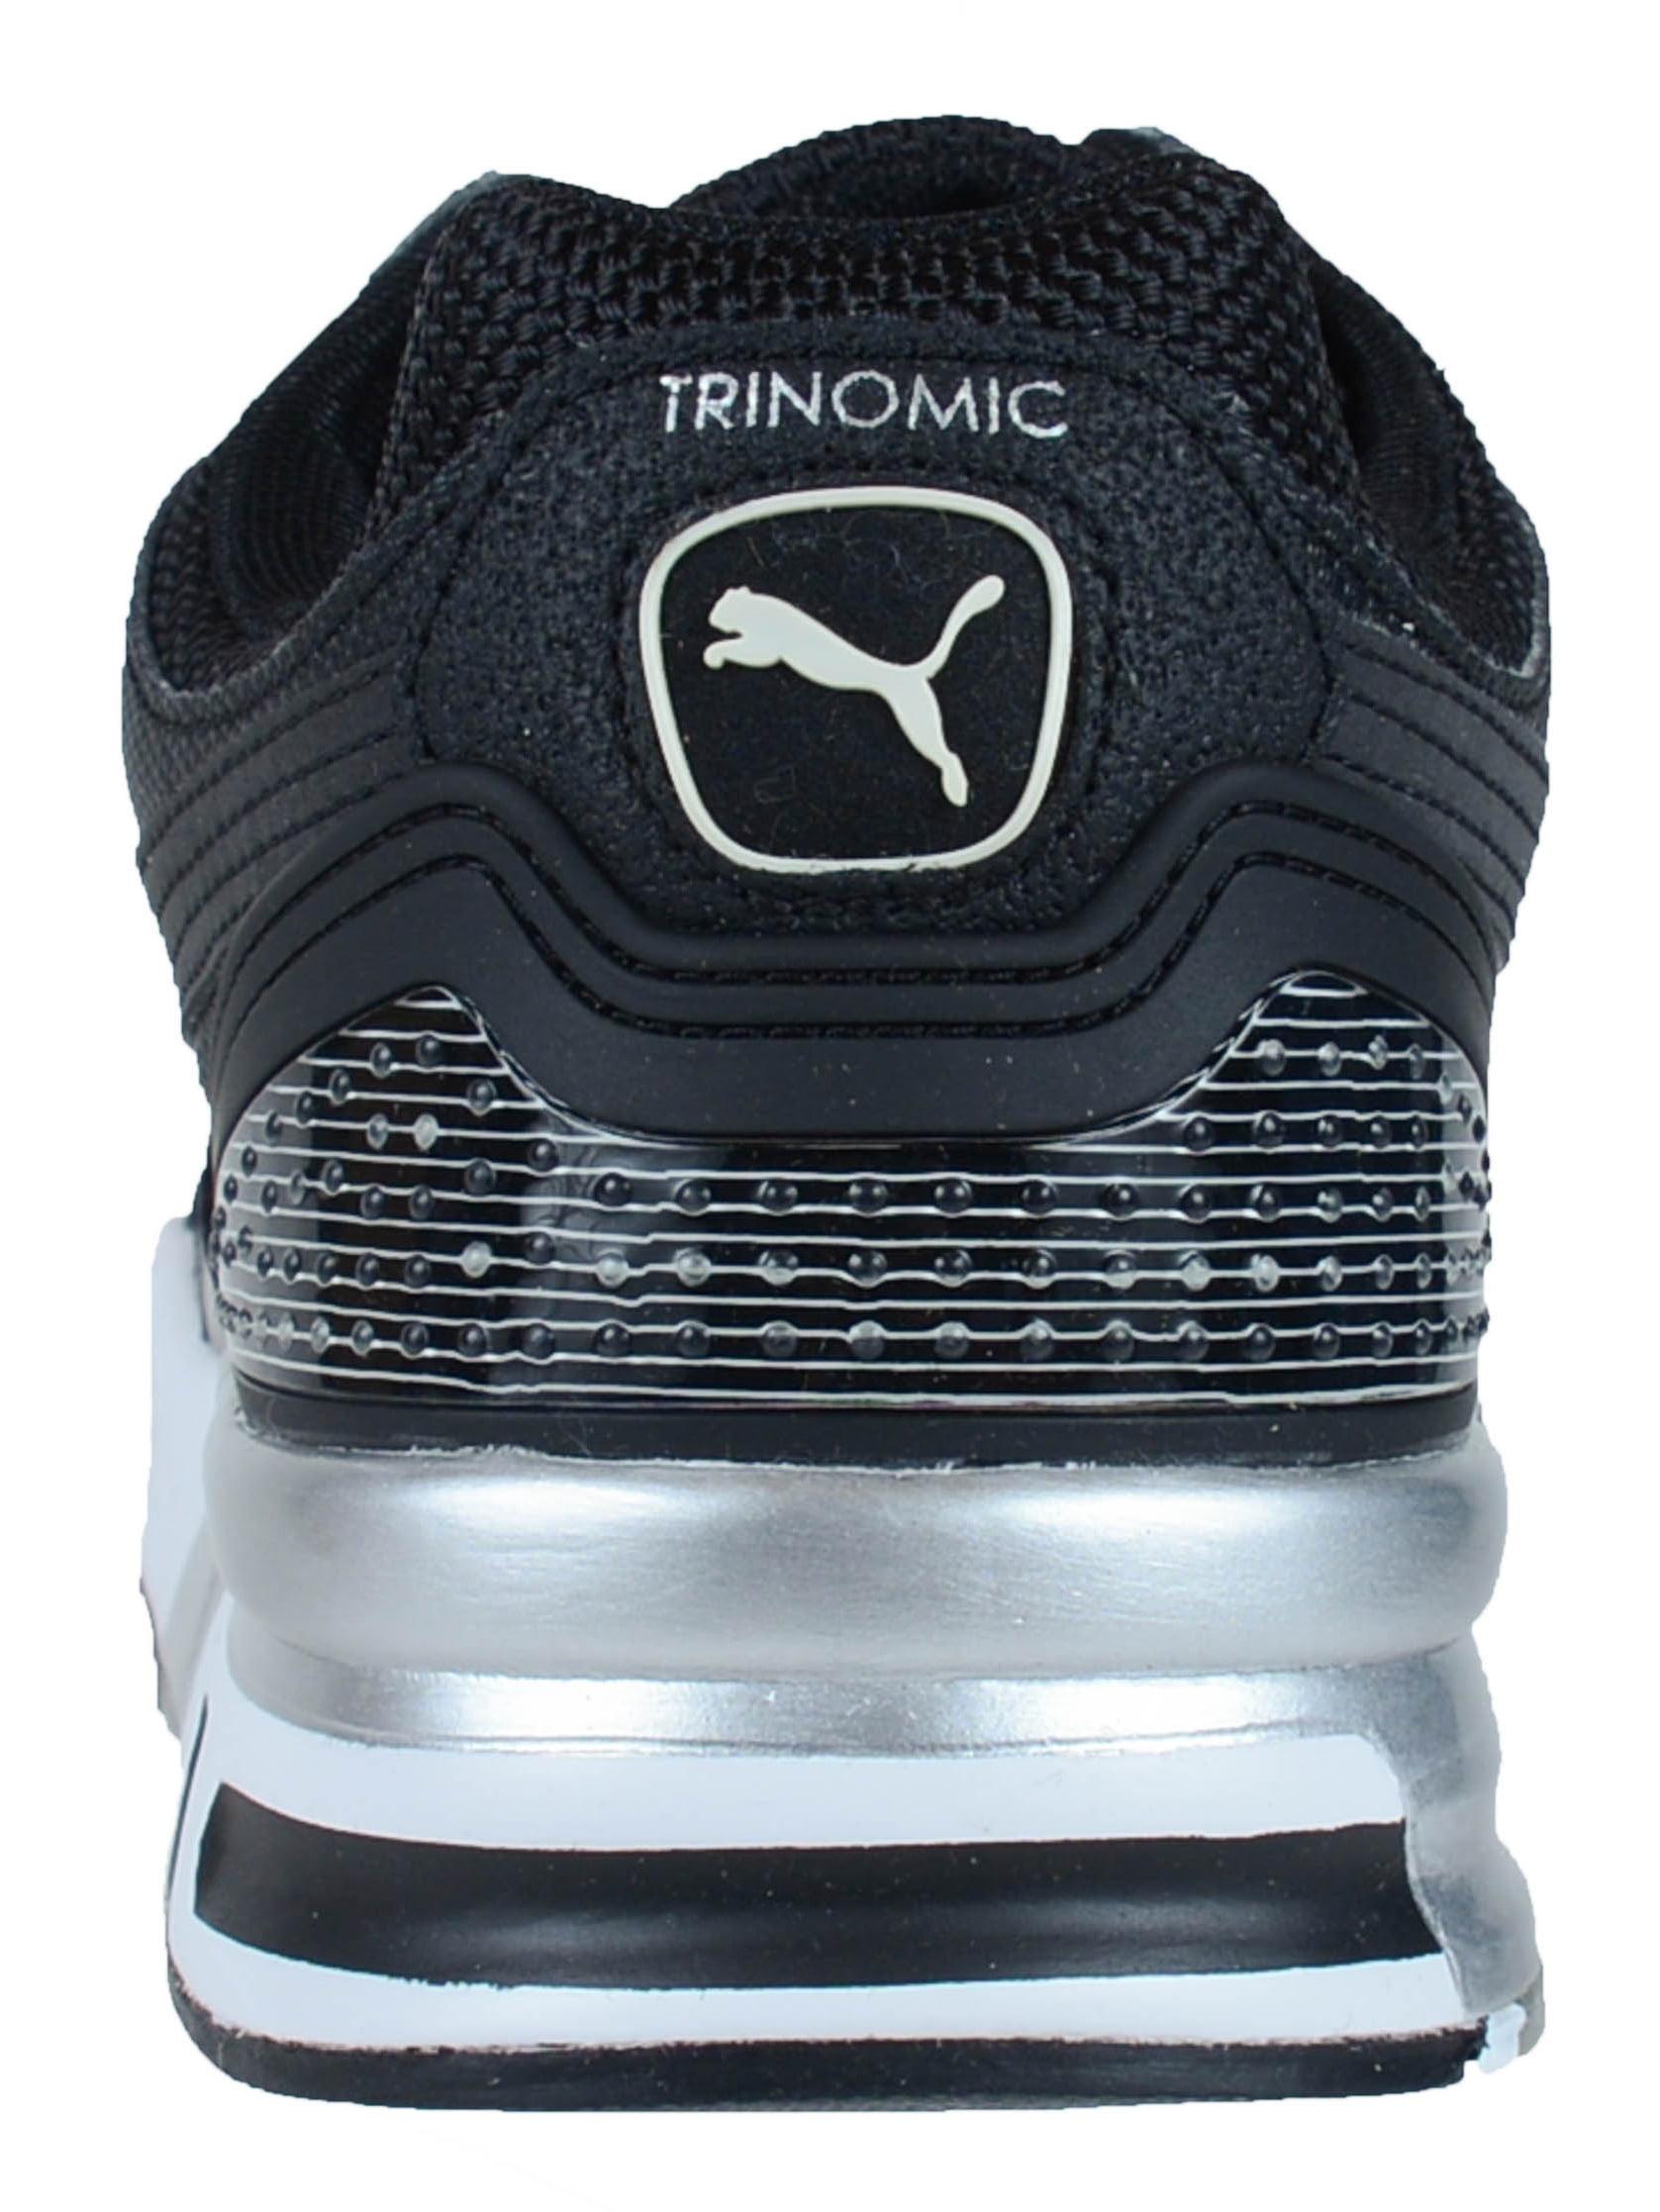 PUMA TRINOMIC XT2 PLUS RETRO RUNNING SHOES BLACK 357006 01